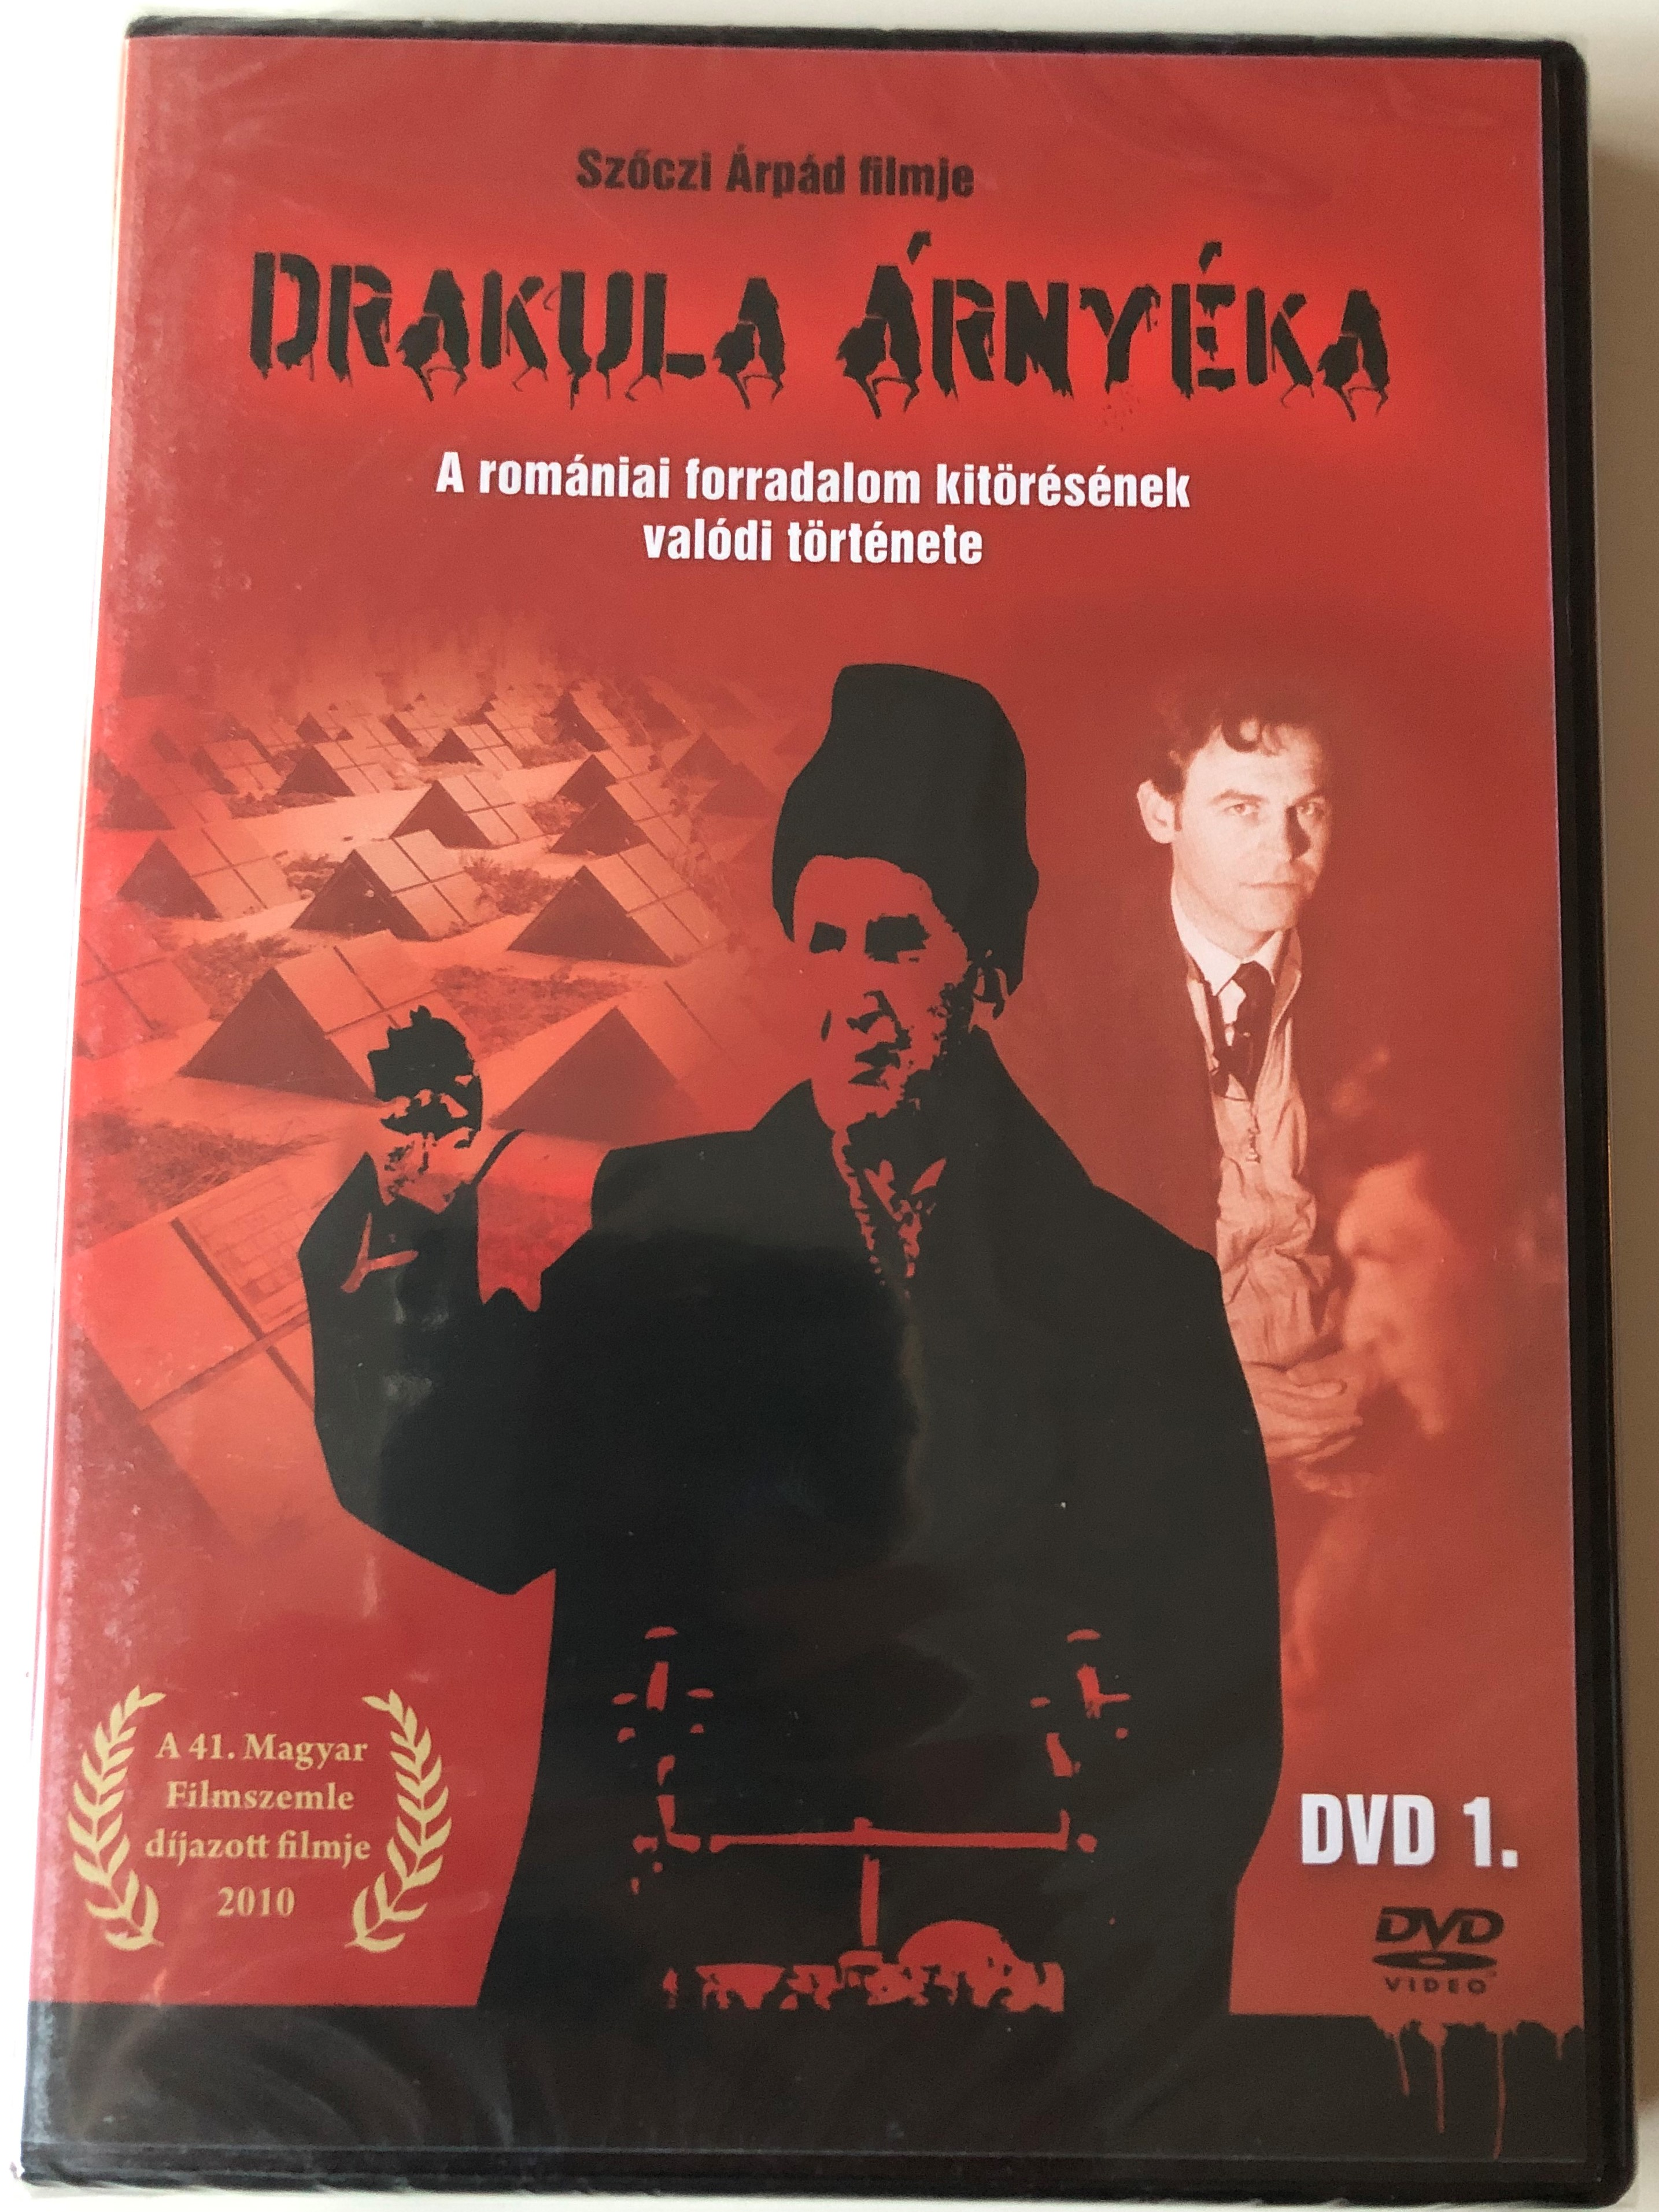 drakula-rny-ka-1.-dvd-2009-the-shadow-of-dracula-part-1-1.jpg